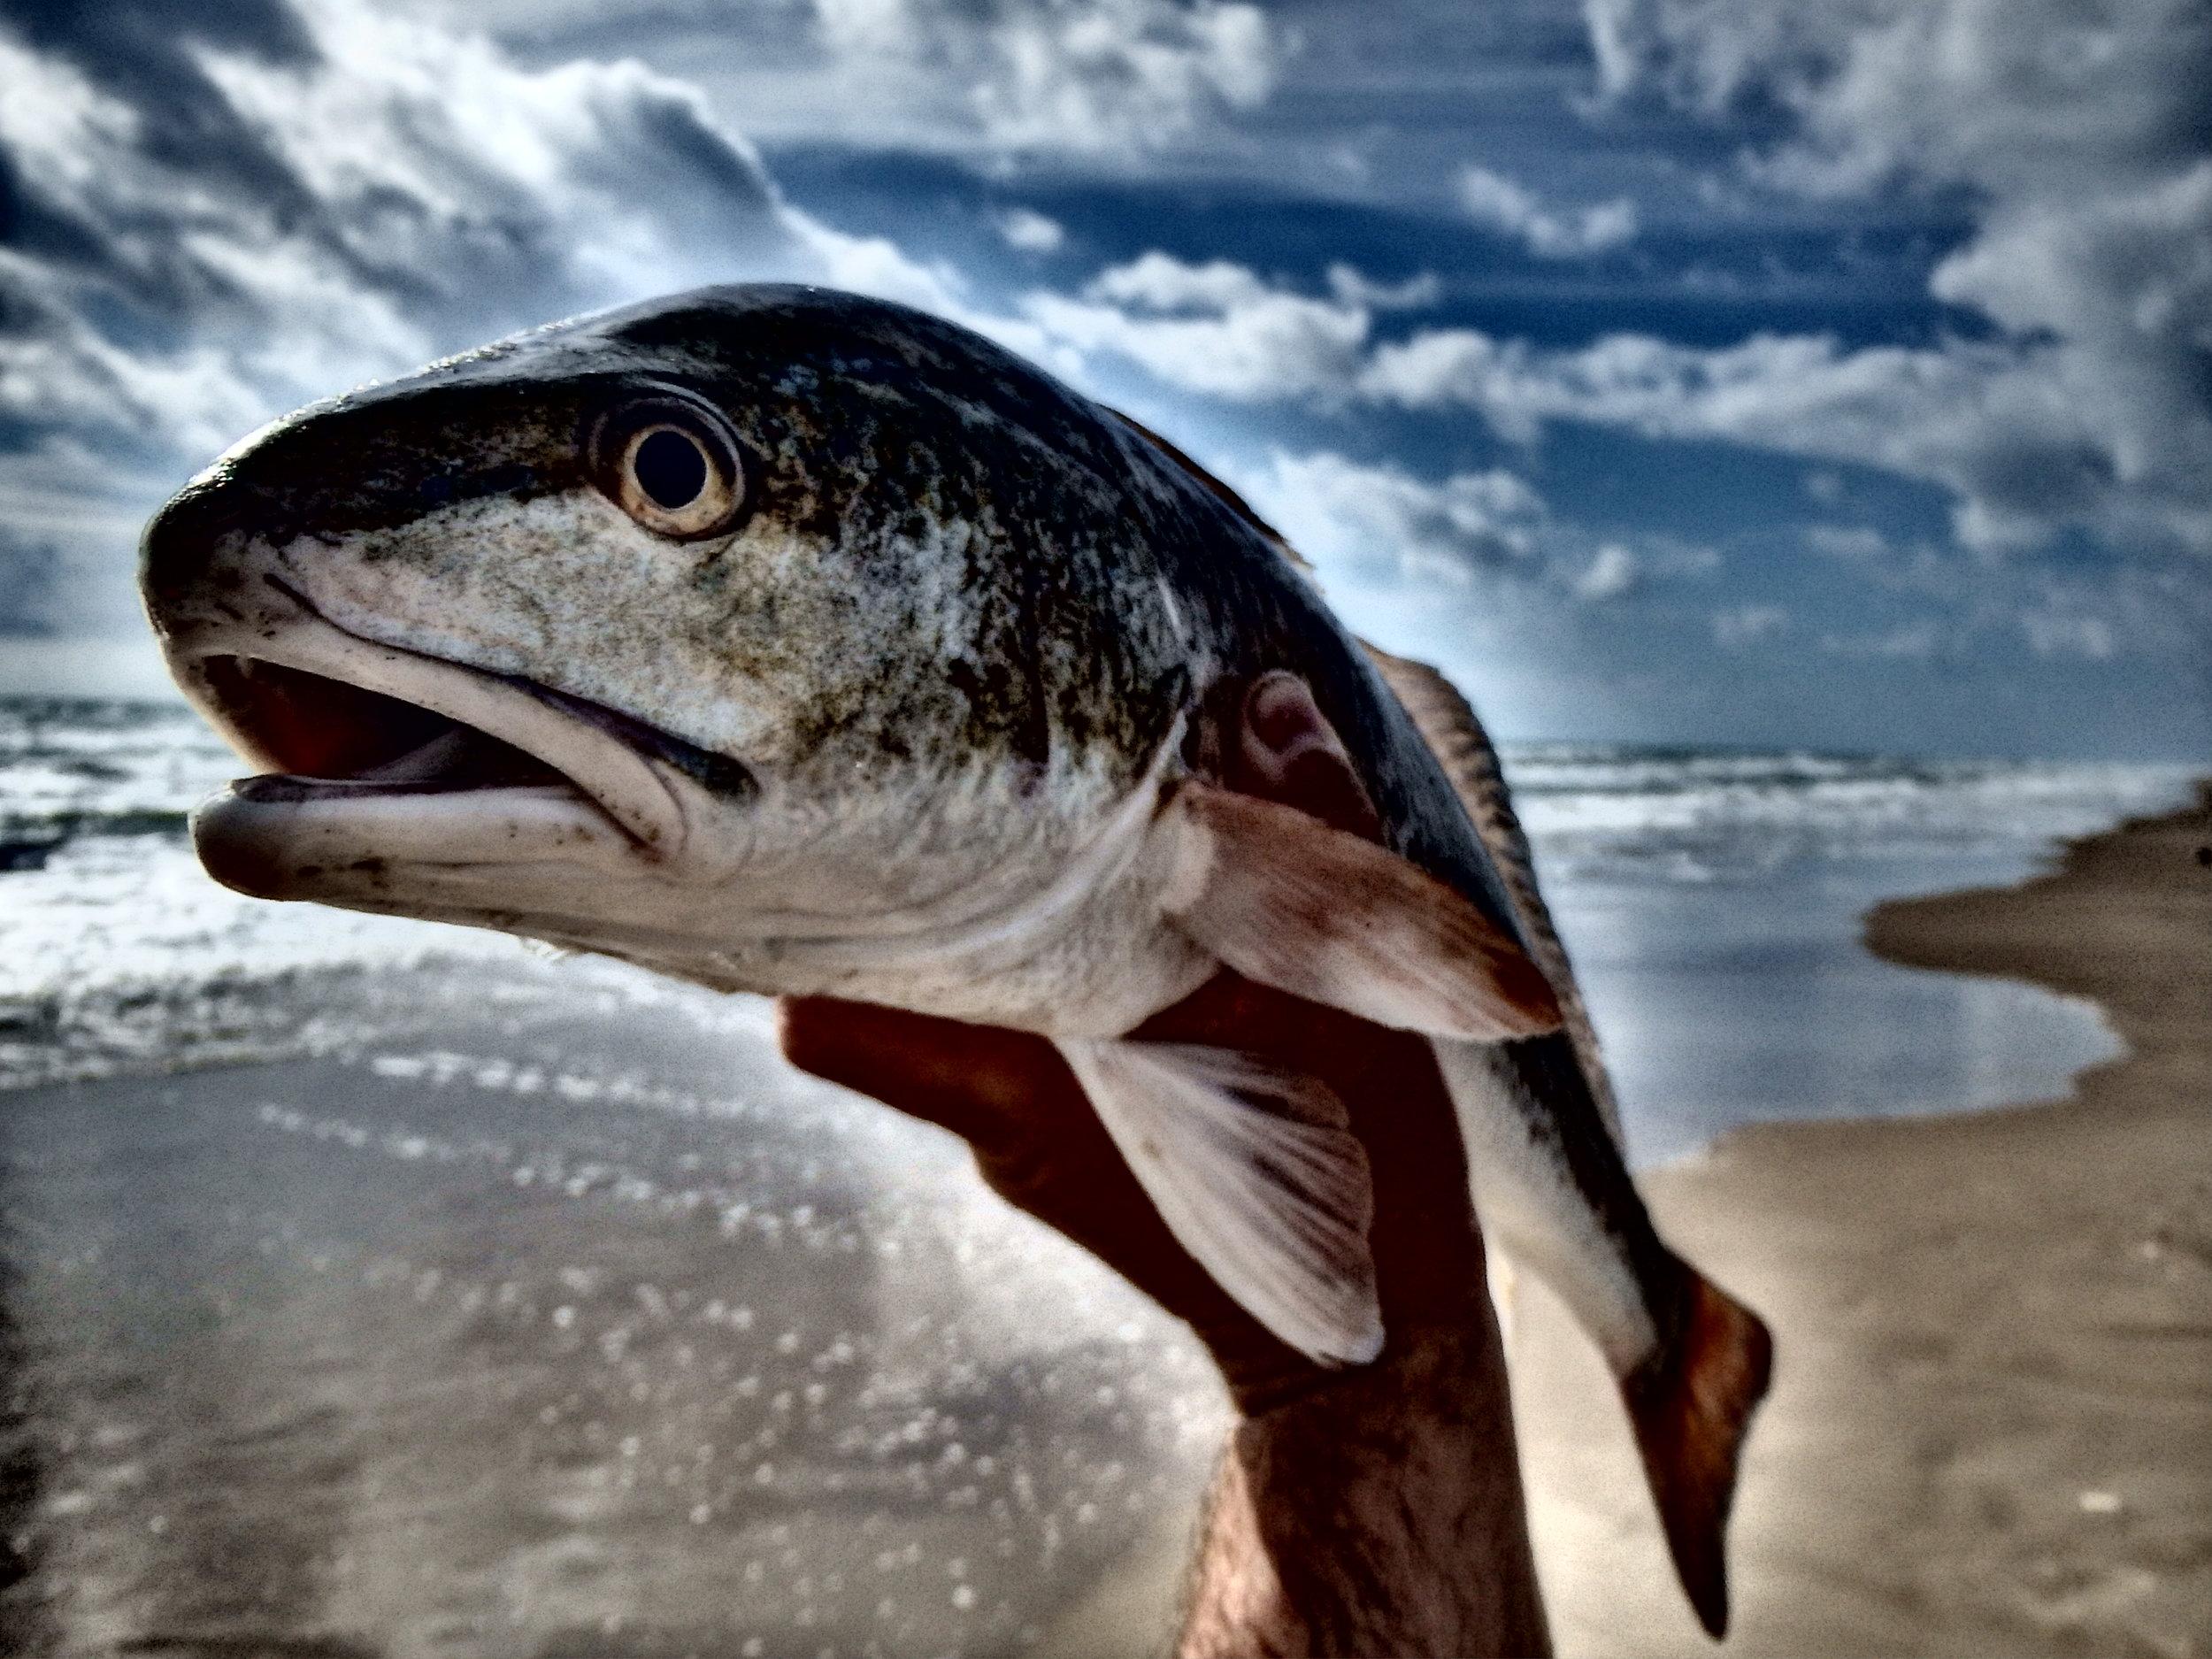 Redfish-fall mullet migration